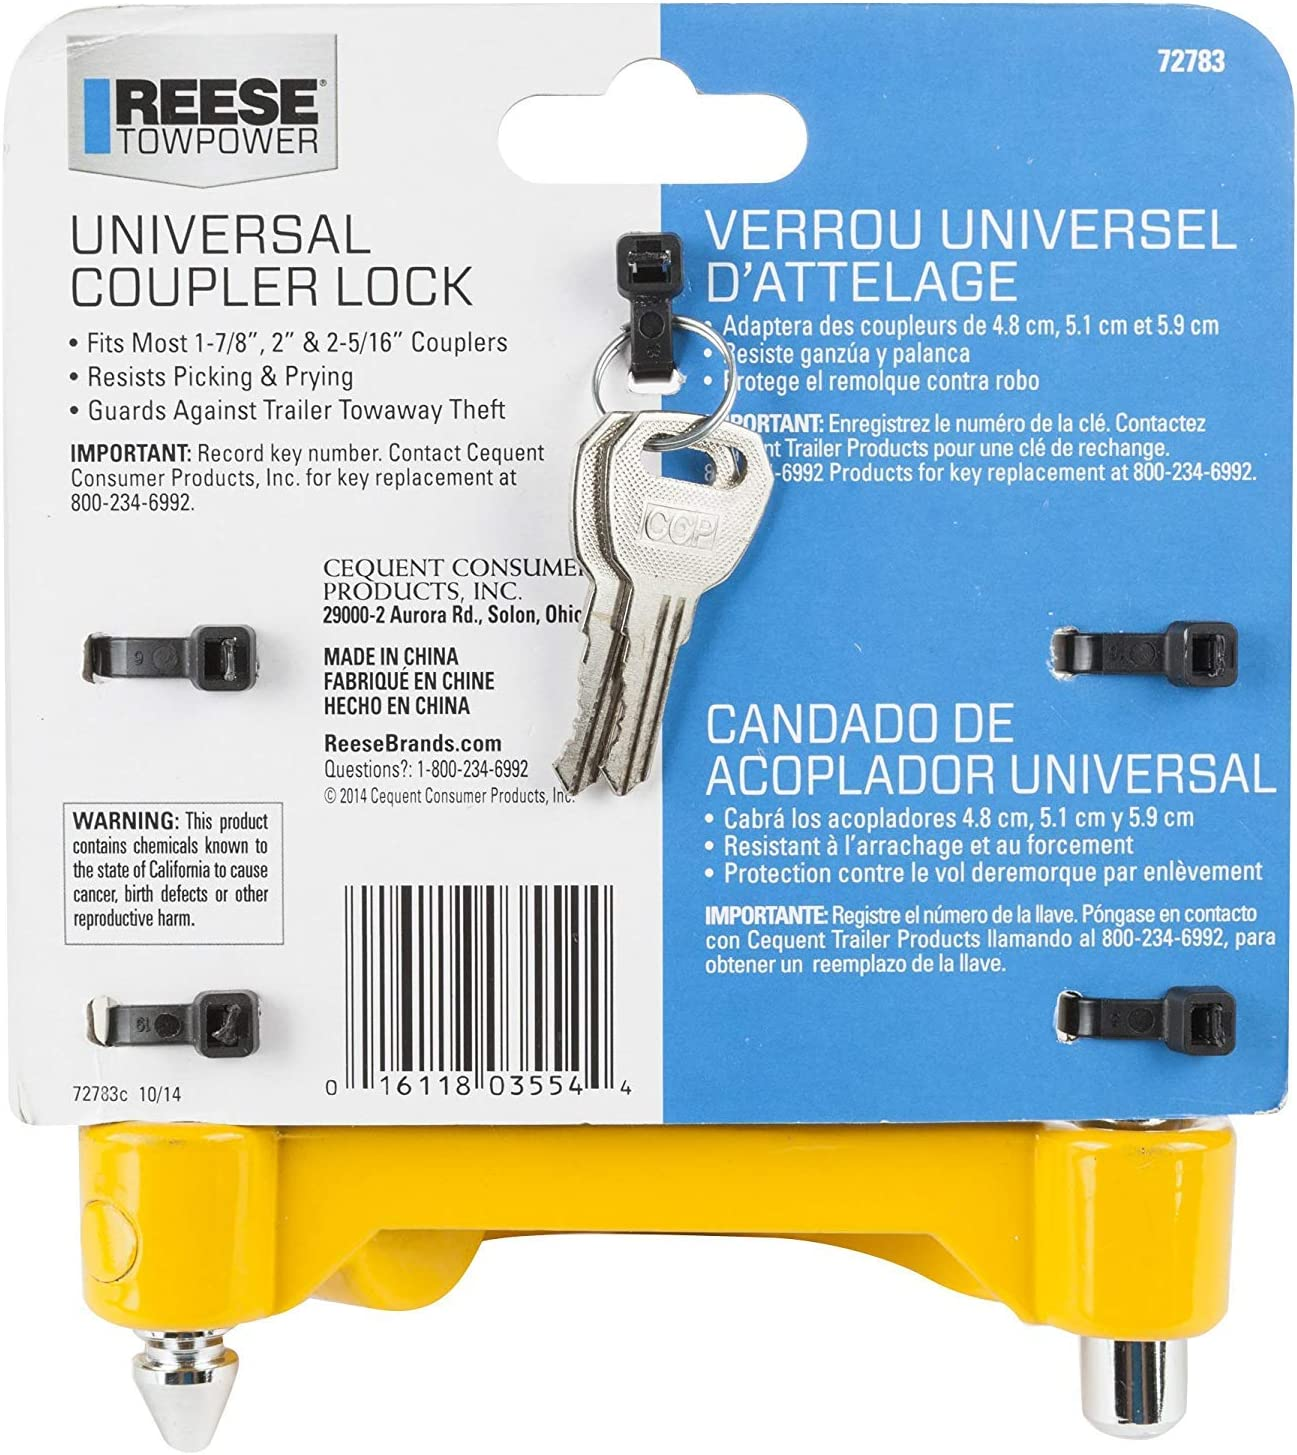 4 Reese Towpower 72783 Universal Coupler Lock Heavy-Duty Steel Adjustable Storage Security